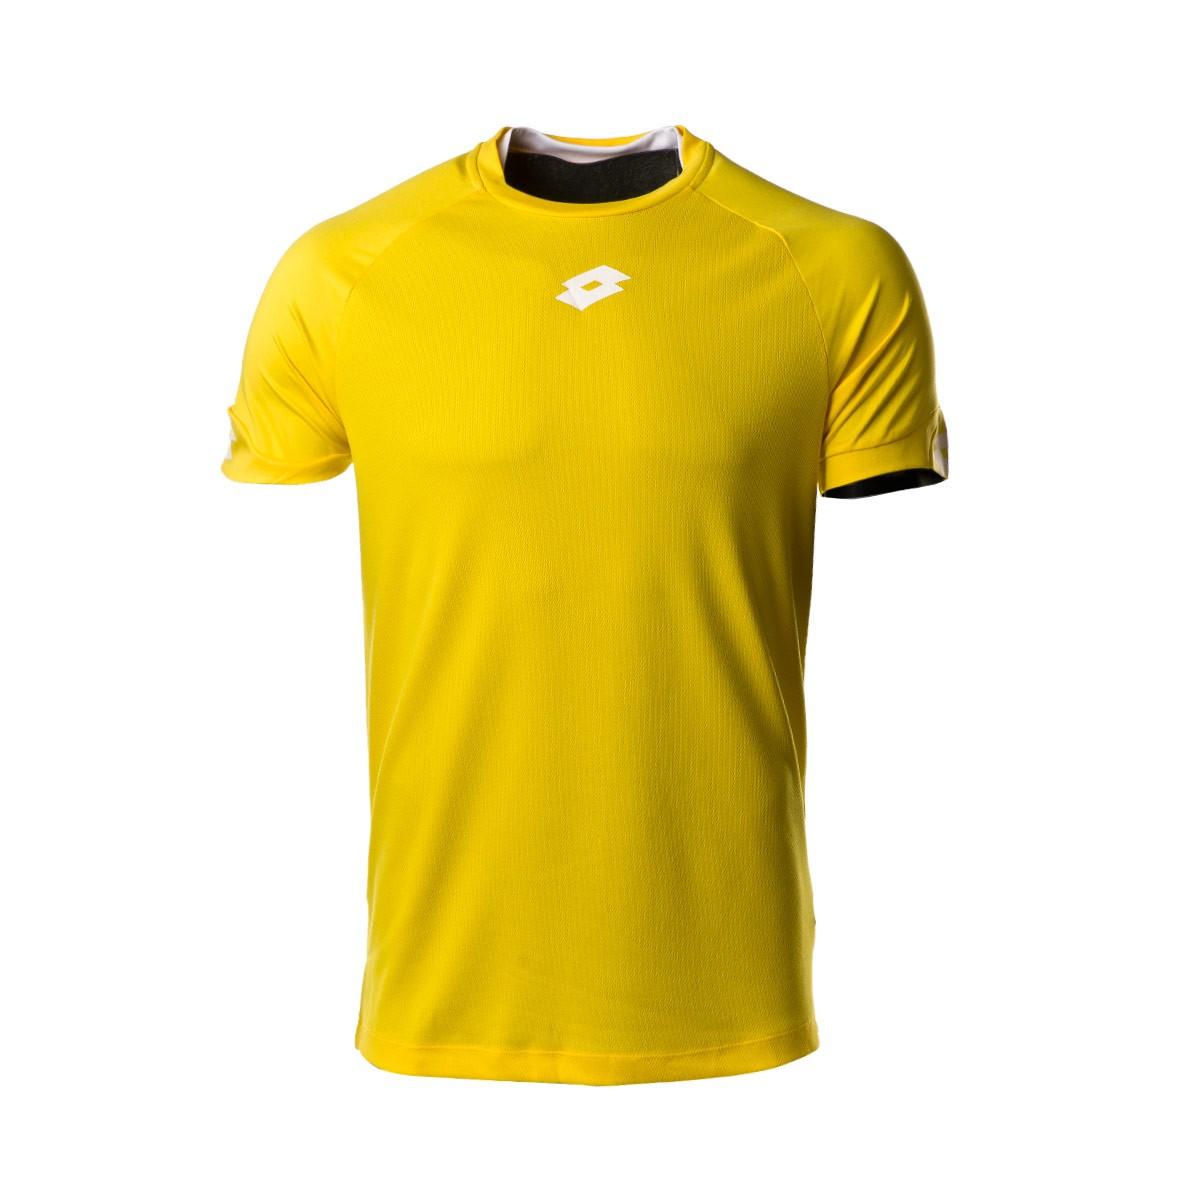 5e0cfaa70 Jersey Lotto Delta Plus m c Yellow-White - Tienda de fútbol Fútbol Emotion